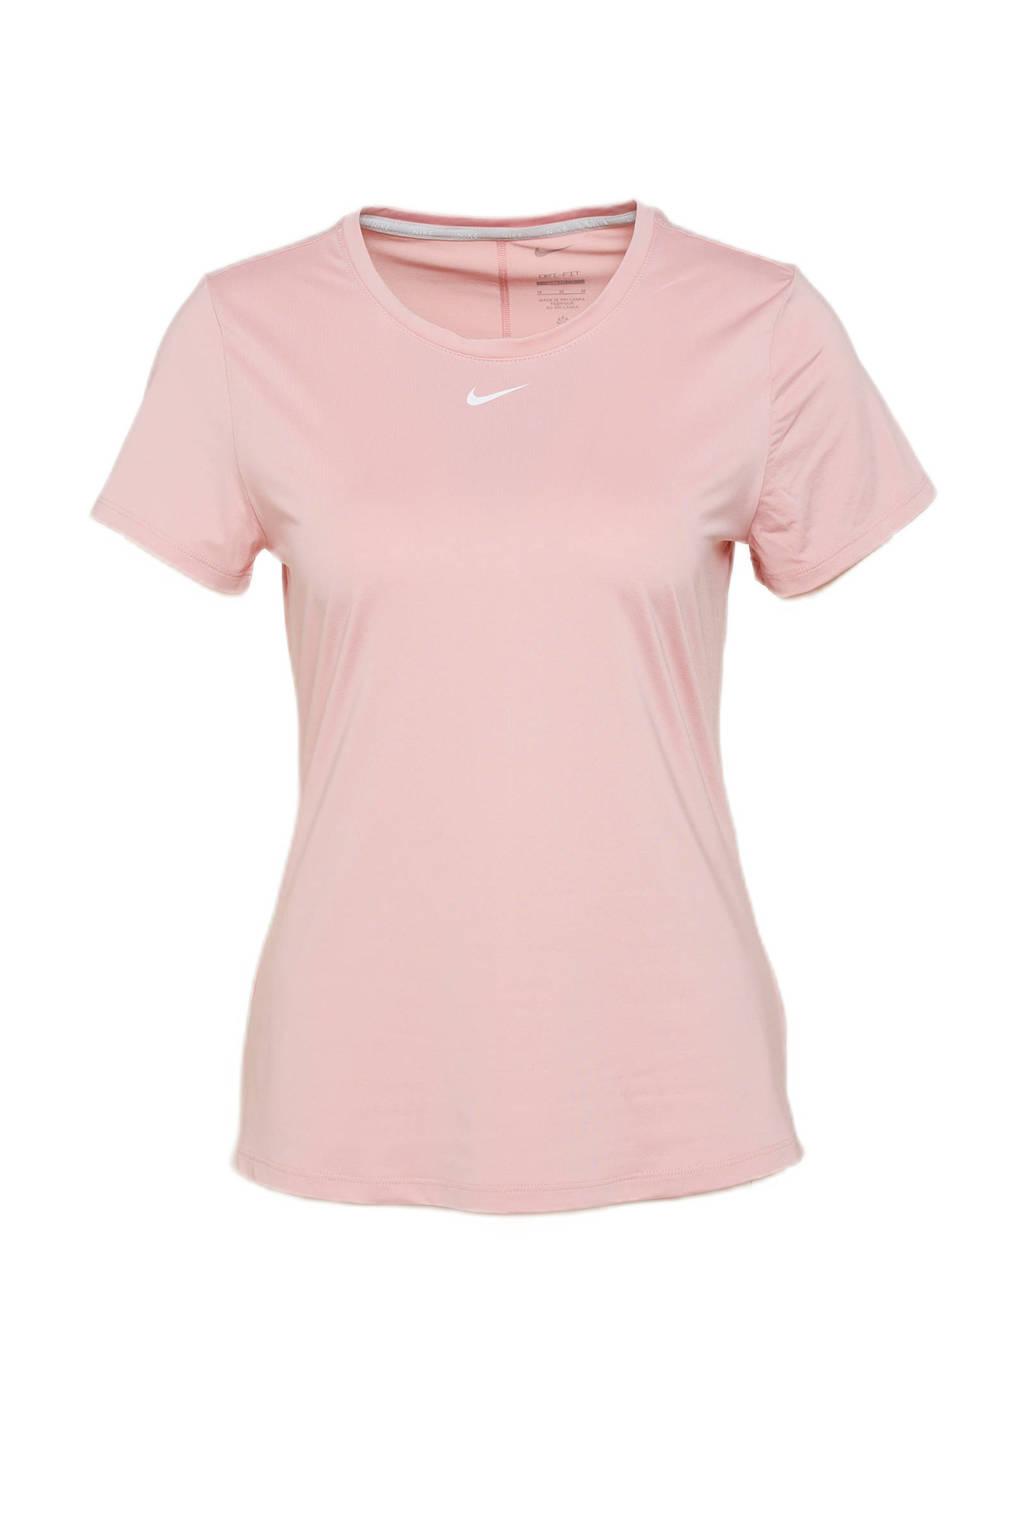 Nike sport T-shirt roze/wit, Roze/wit